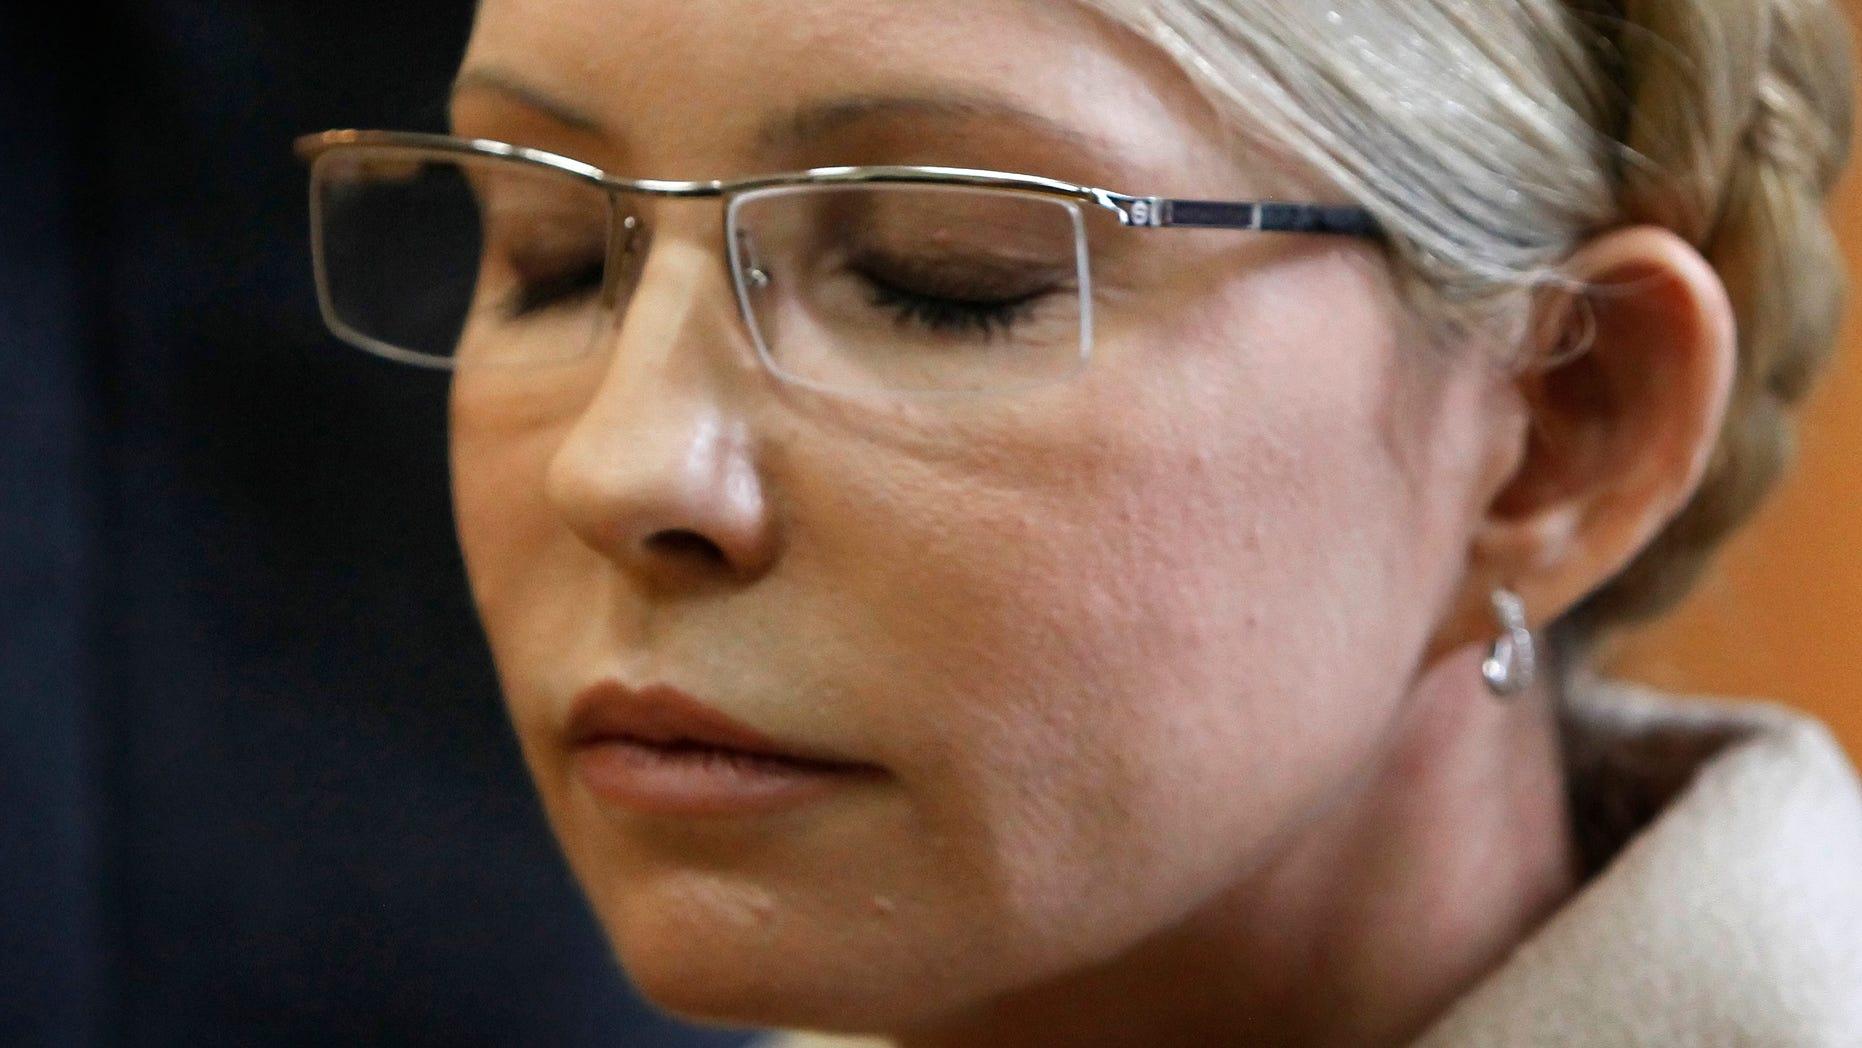 Former Ukrainian Prime Minister Yulia Tymoshenko reacts during her trial, at the Pecherskiy District Court in Kiev, Ukraine, Tuesday, Oct. 11, 2011.